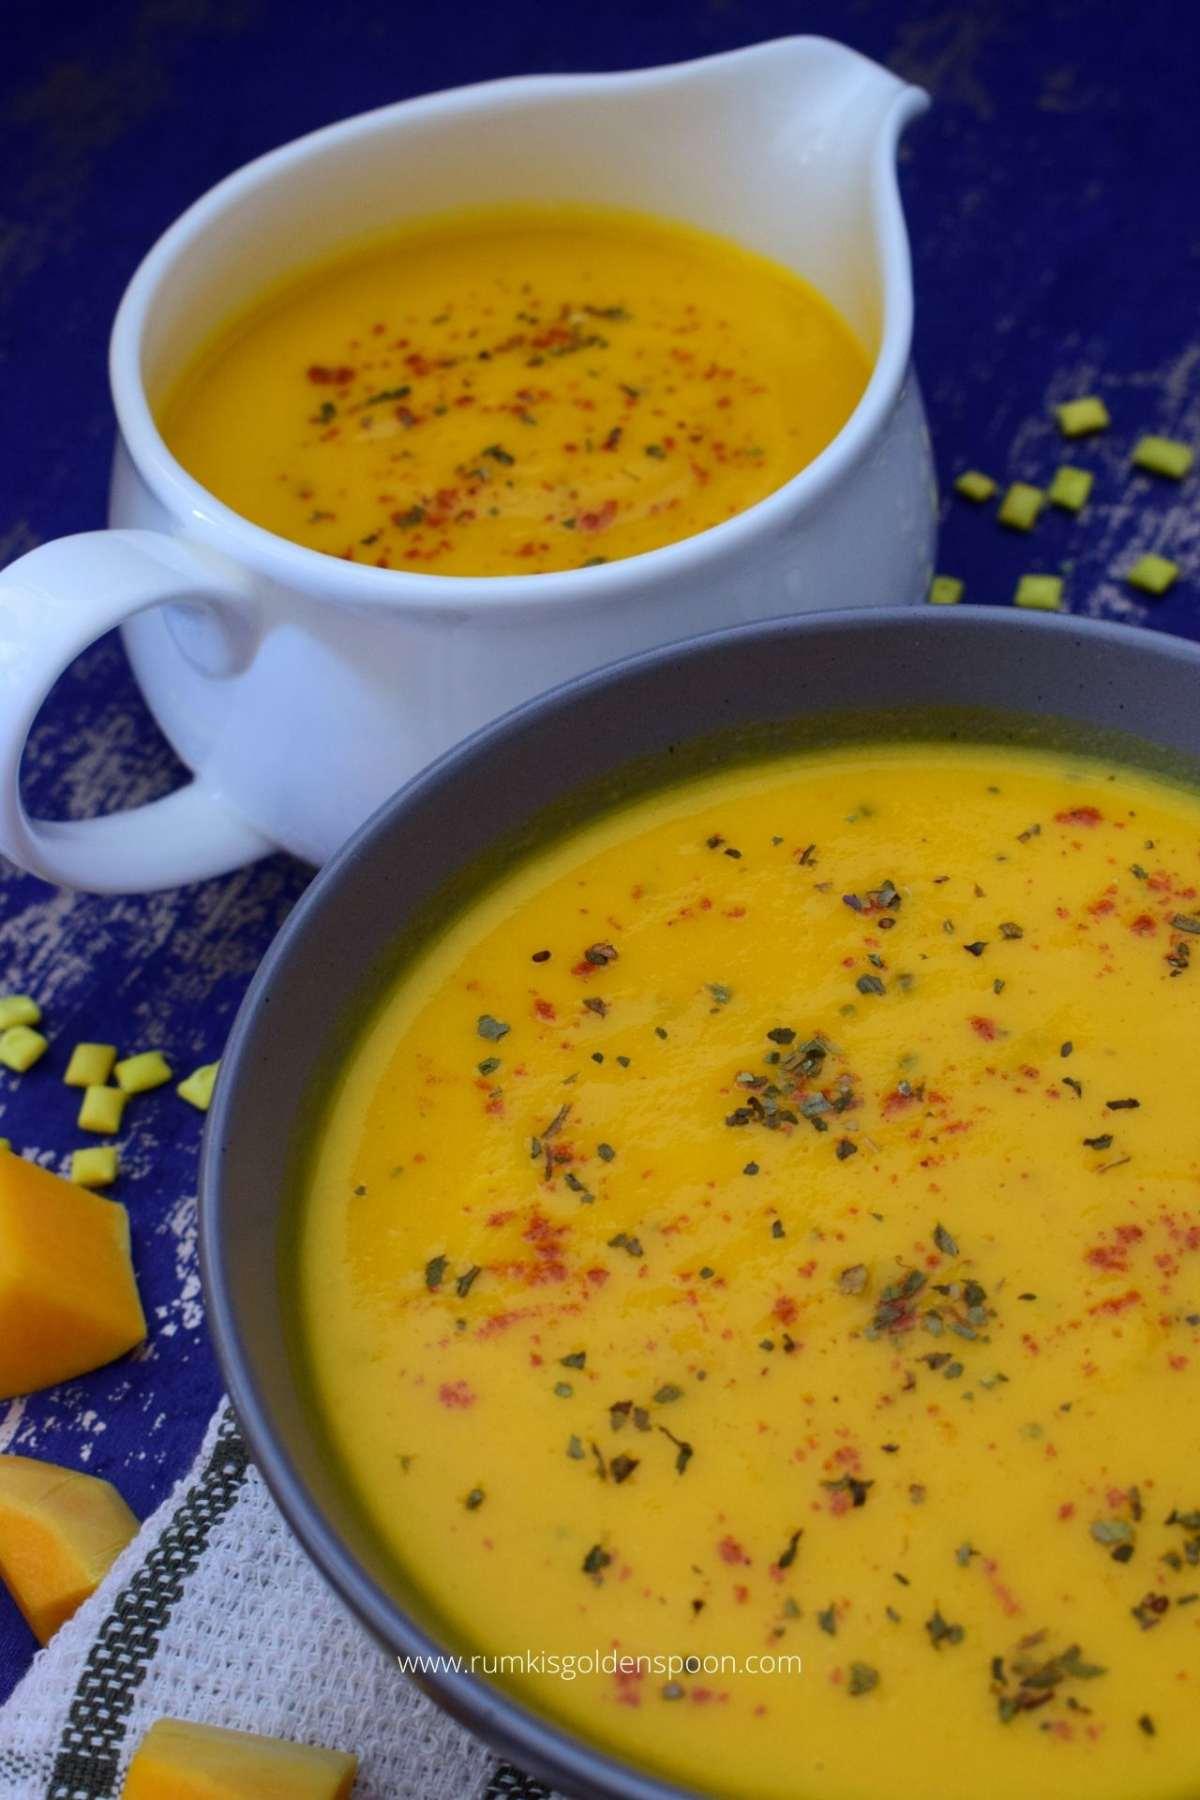 butternut squash soup recipe, butternut squash soup recipes, butternut squash soup, for butternut squash soup, butternut squash recipe soup, soup recipe vegetable, vegetarian soup recipe, soup recipe best, soup recipe easy, easy recipe of soup, soup recipes veg, soup recipe healthy, healthy soup recipe vegetarian, butternut squash recipe best, butternut squash recipe healthy, butternut squash recipes healthy, butternut squash recipe easy, butternut squash recipe for thanksgiving, health benefits of butternut squash, how to make butternut squash soup, Rumki's Golden Spoon